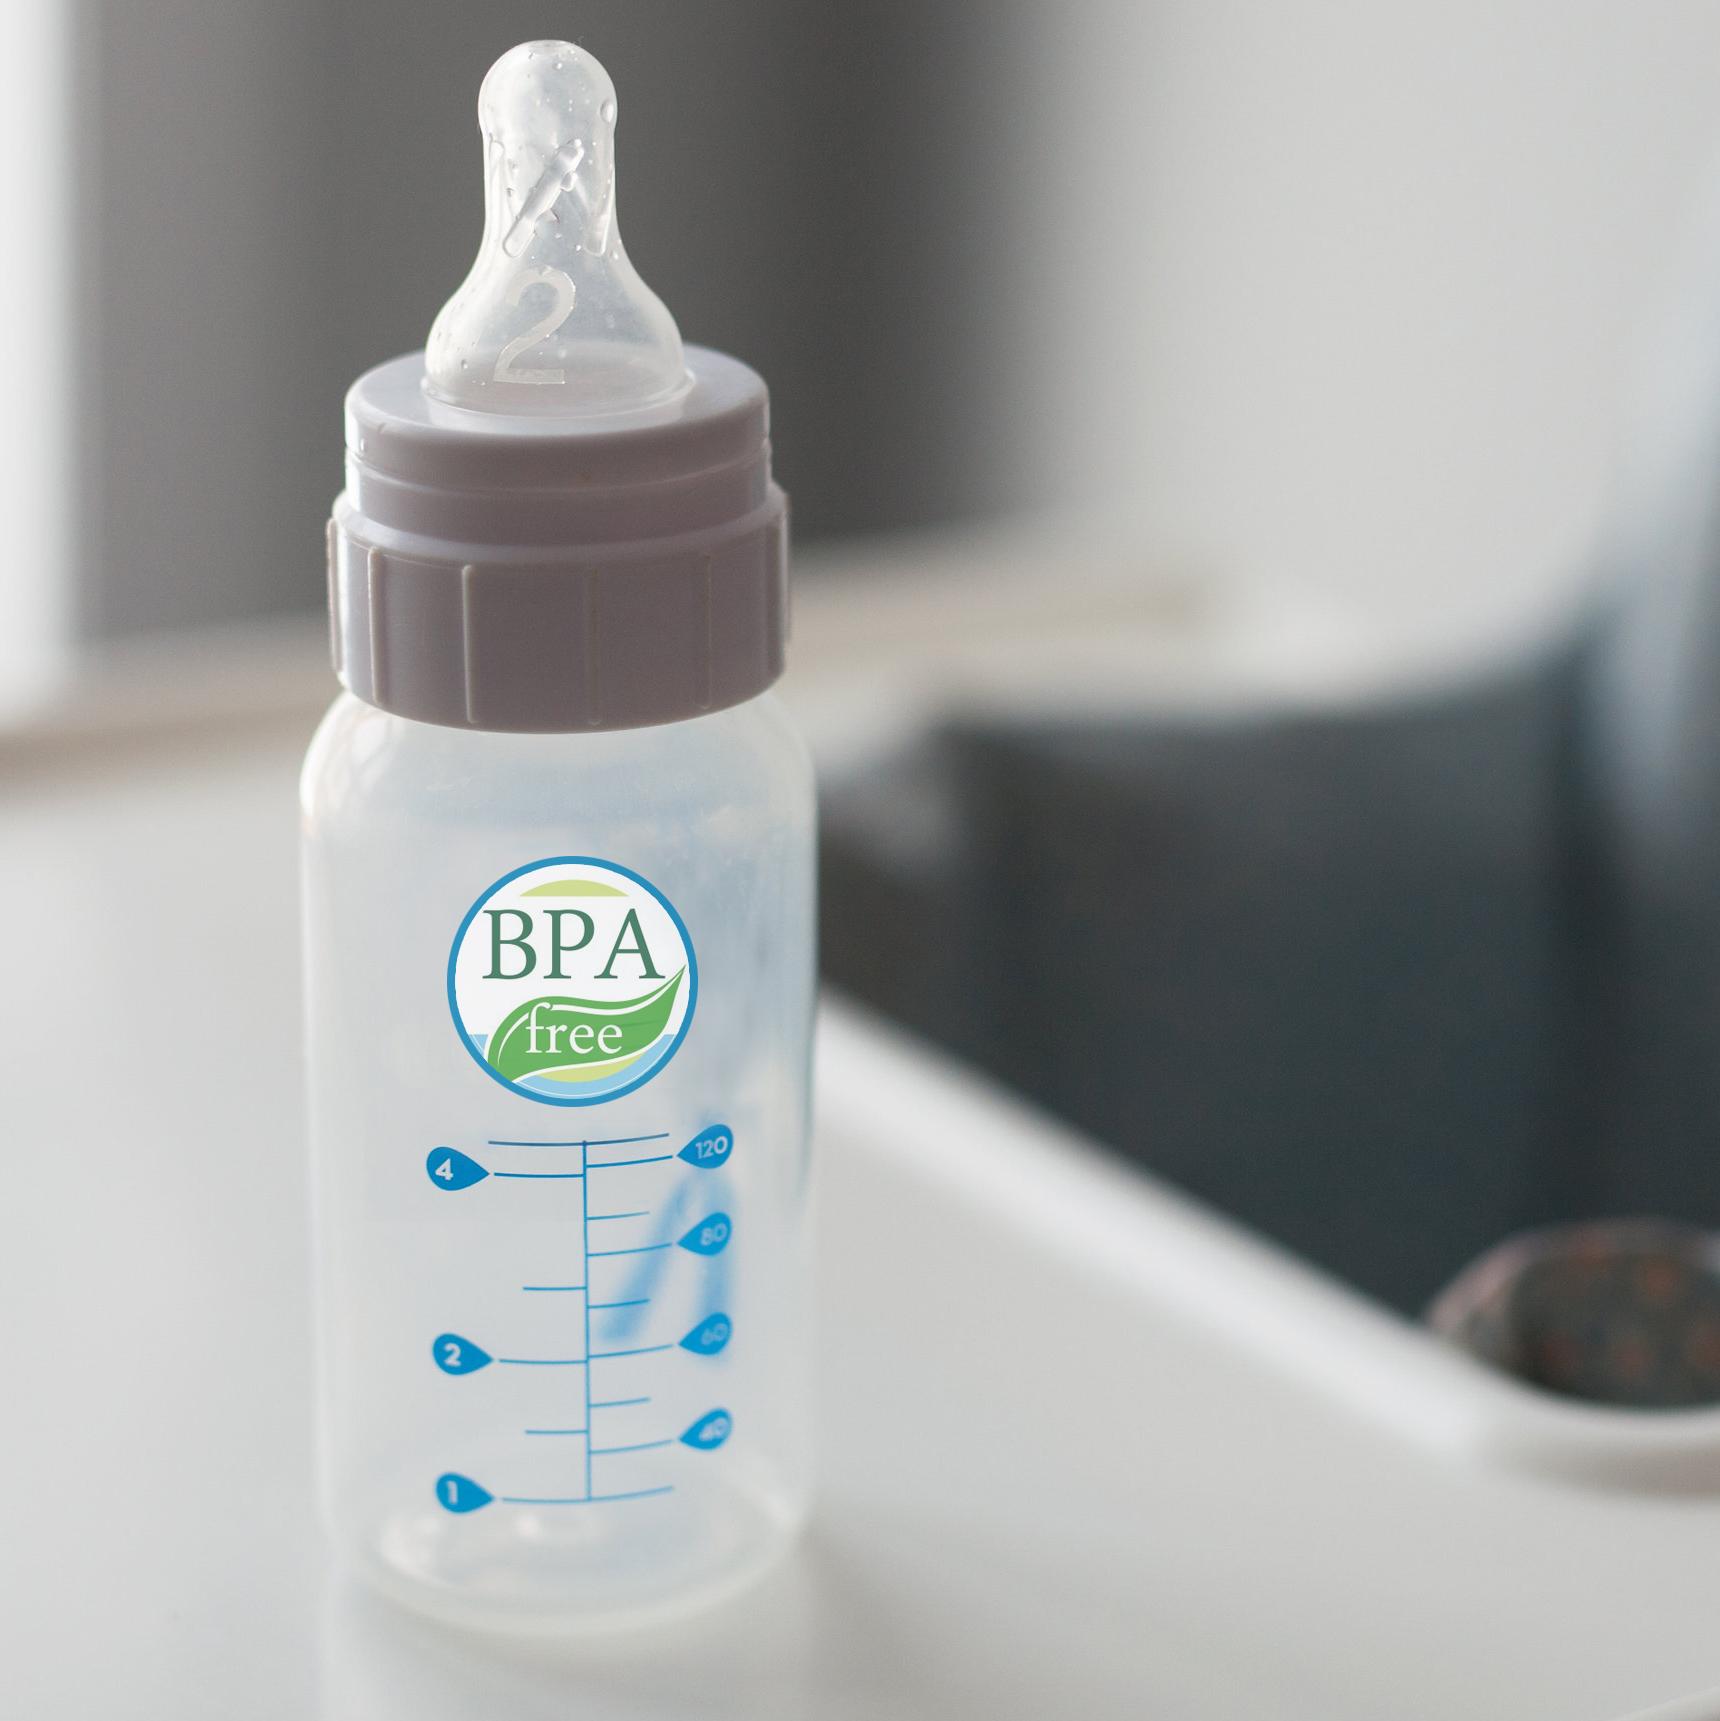 BPA-free plastics still might contain hazardous compounds.